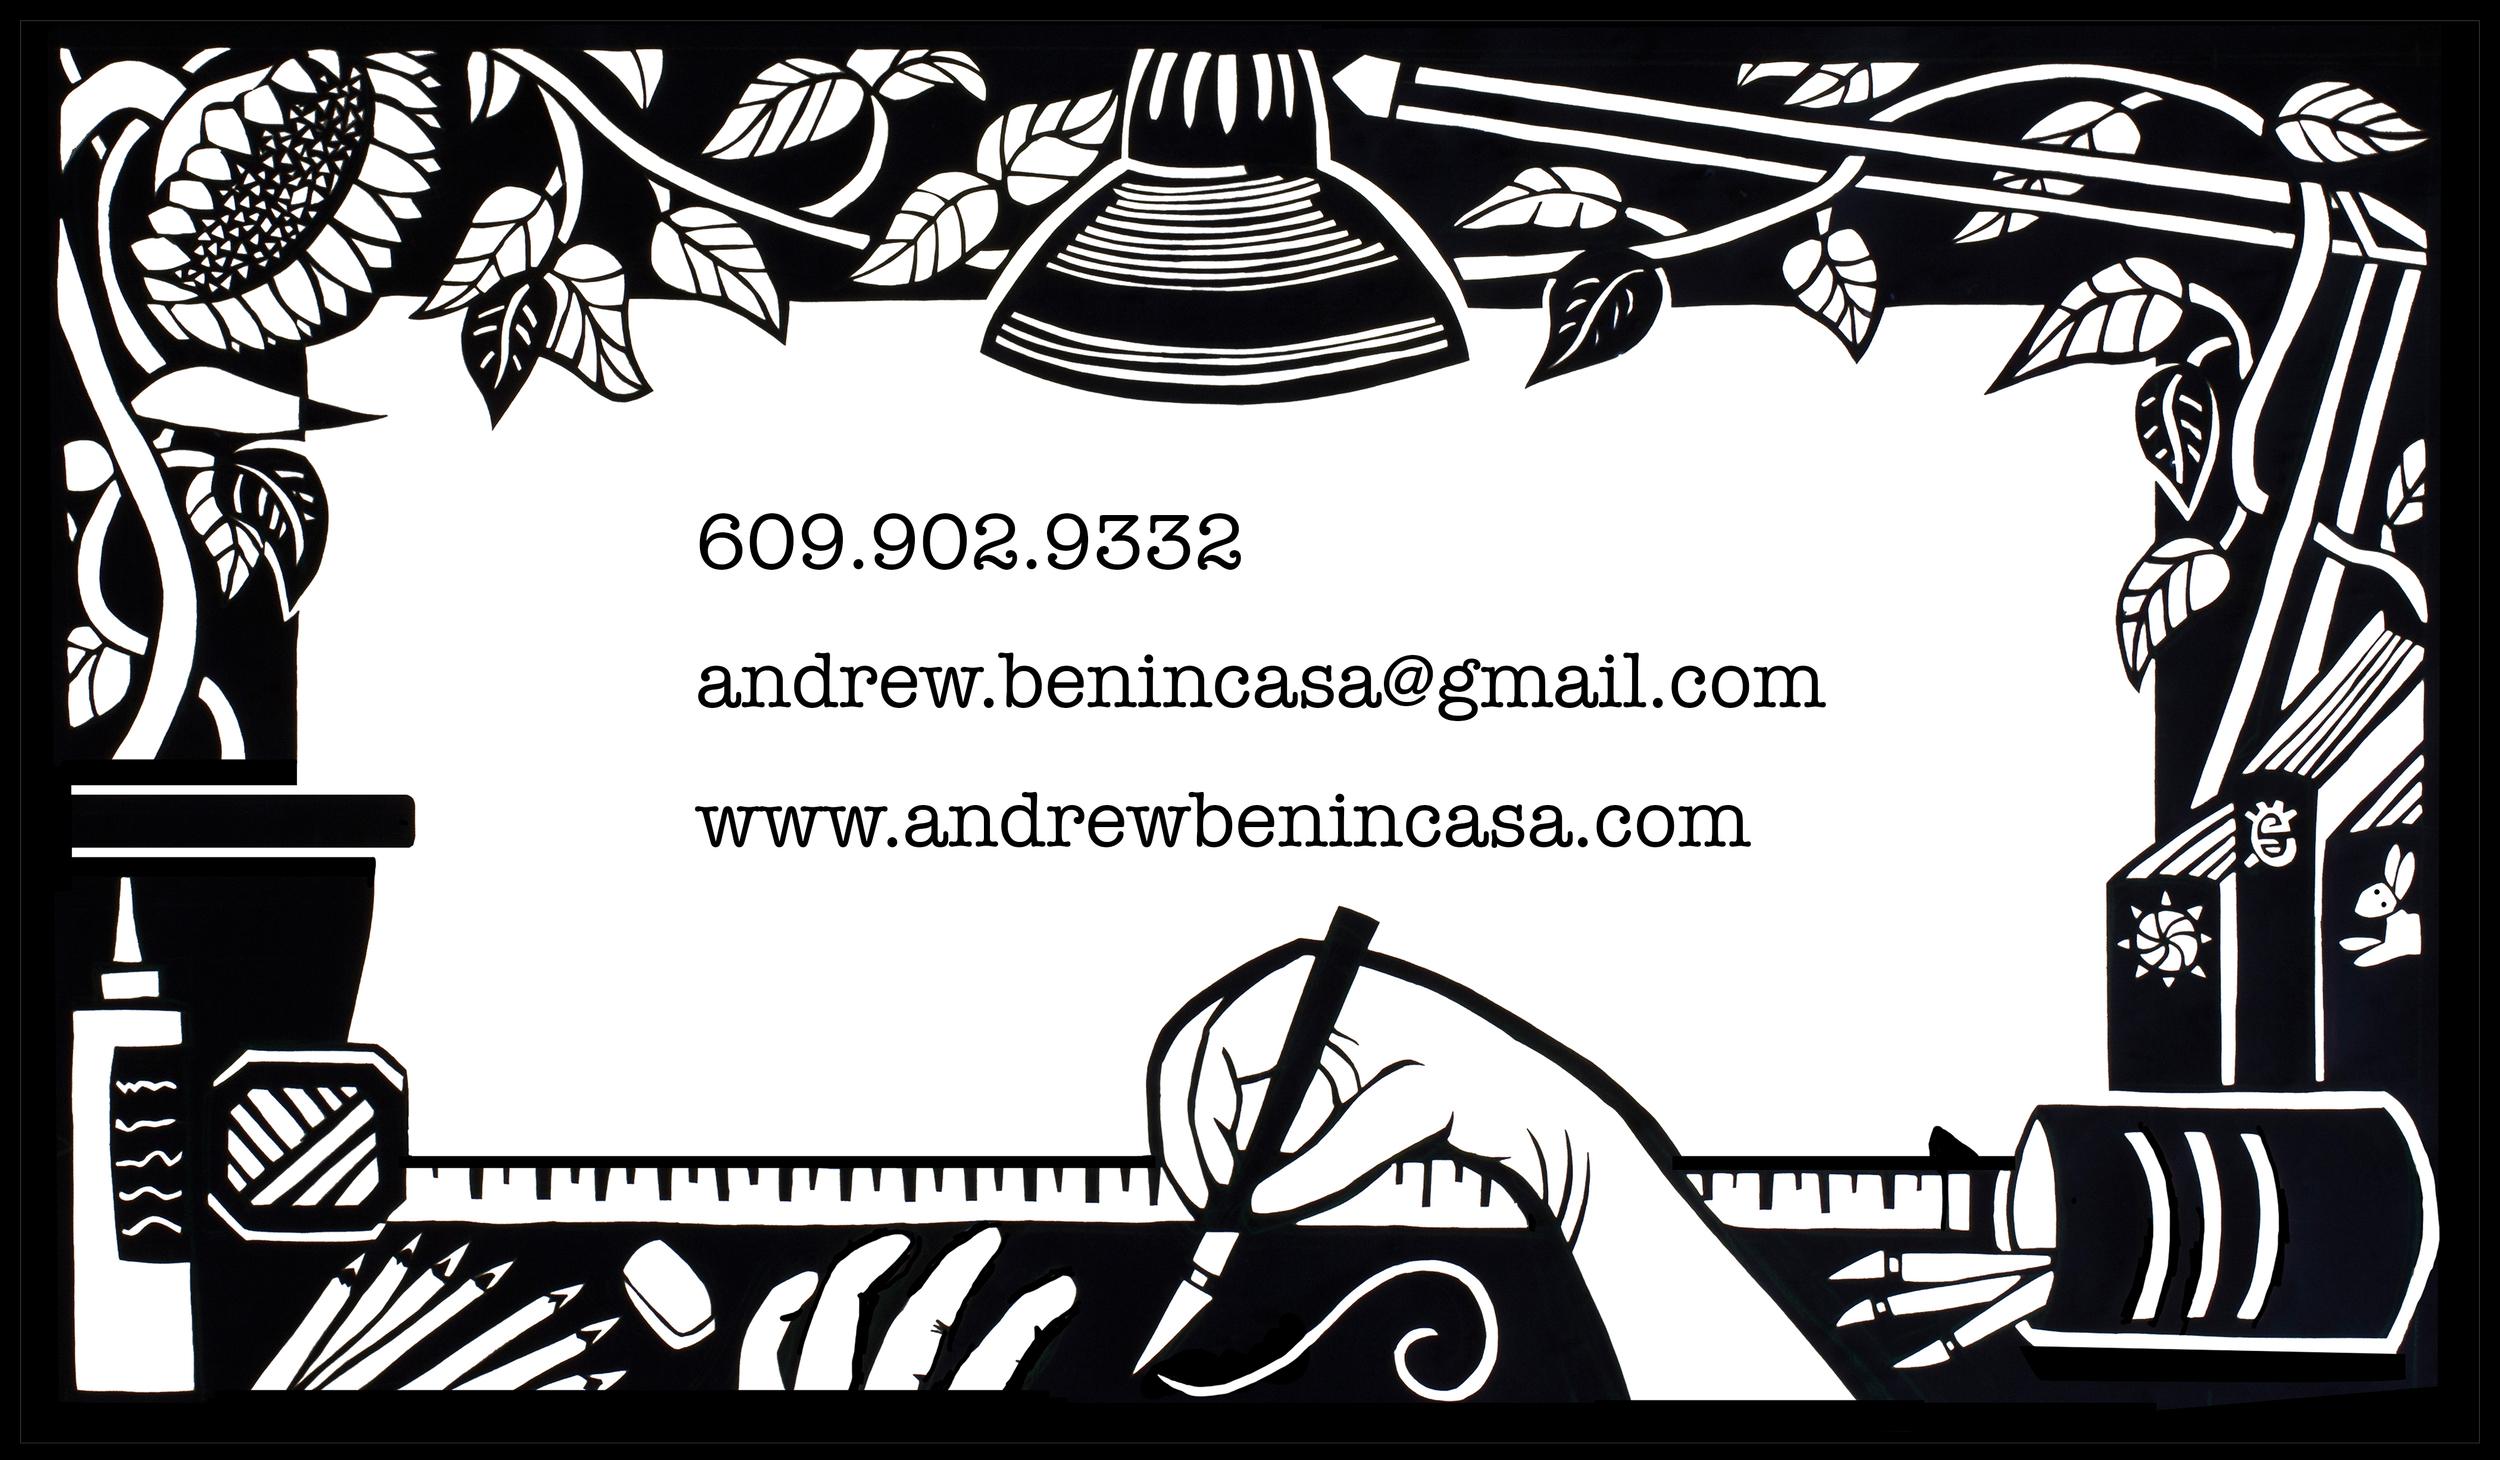 business card back print.jpg